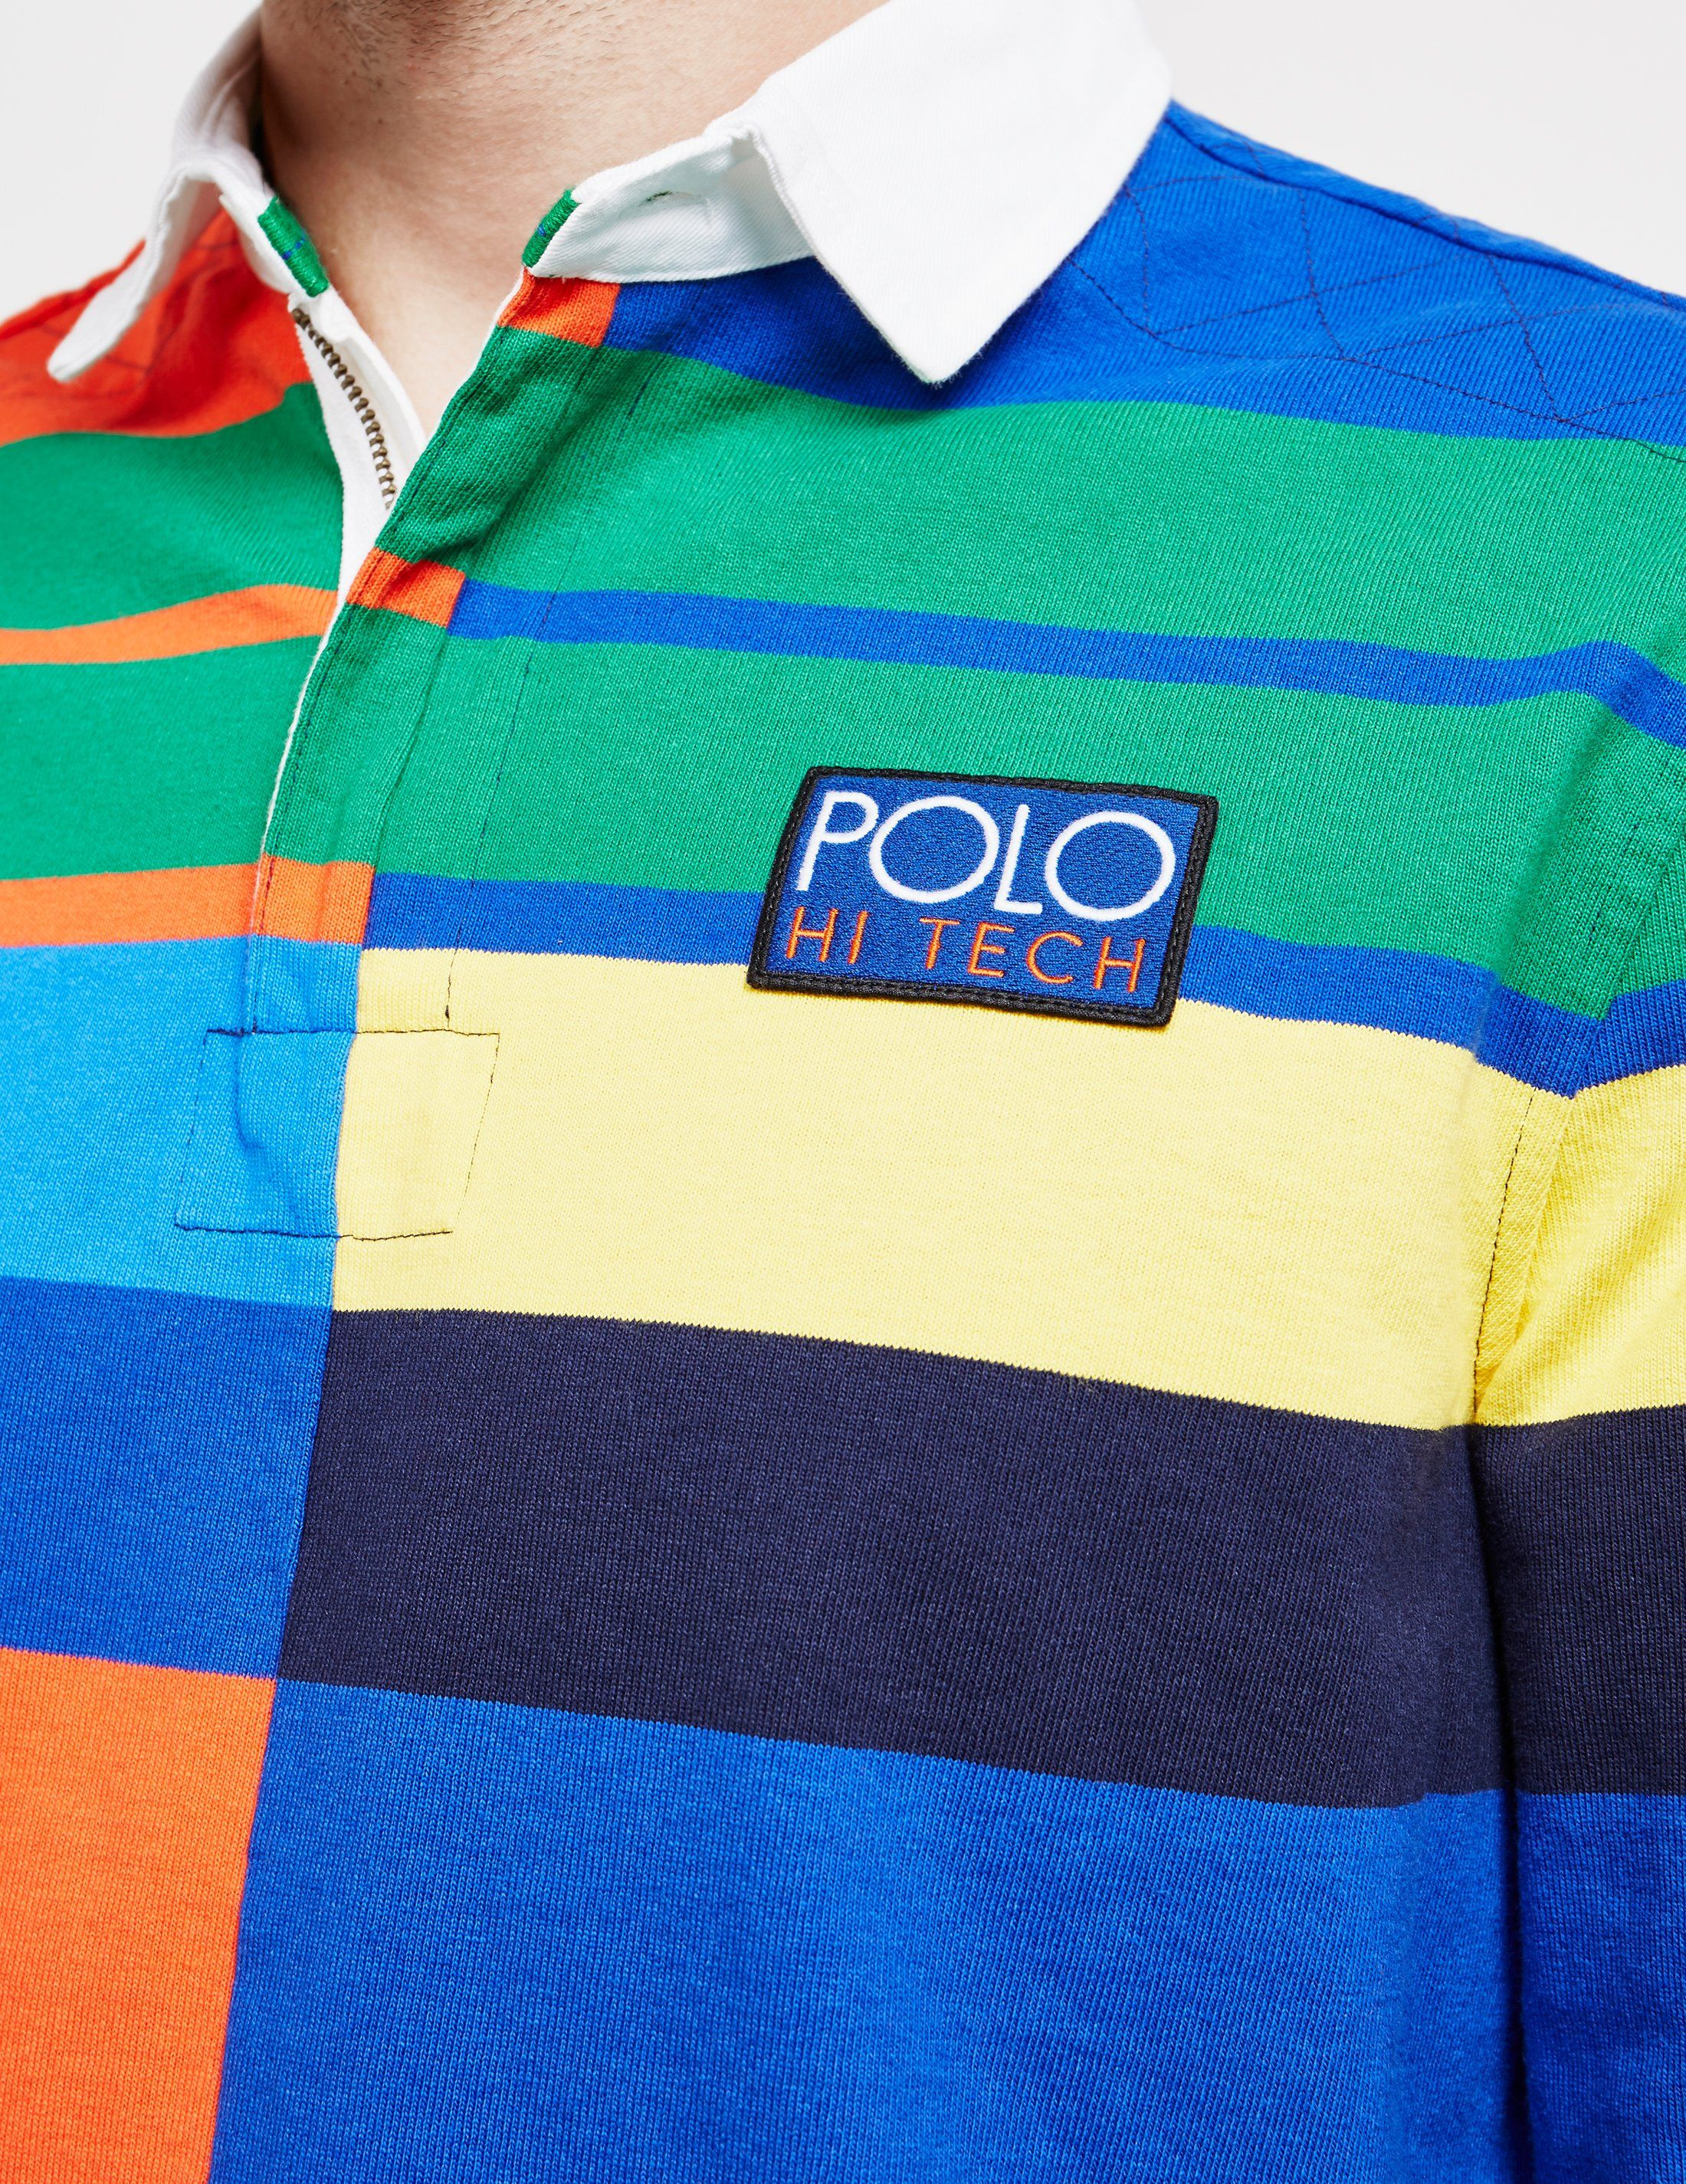 Polo Ralph Lauren Hi Tech Rugby Short Sleeve Polo Shirt